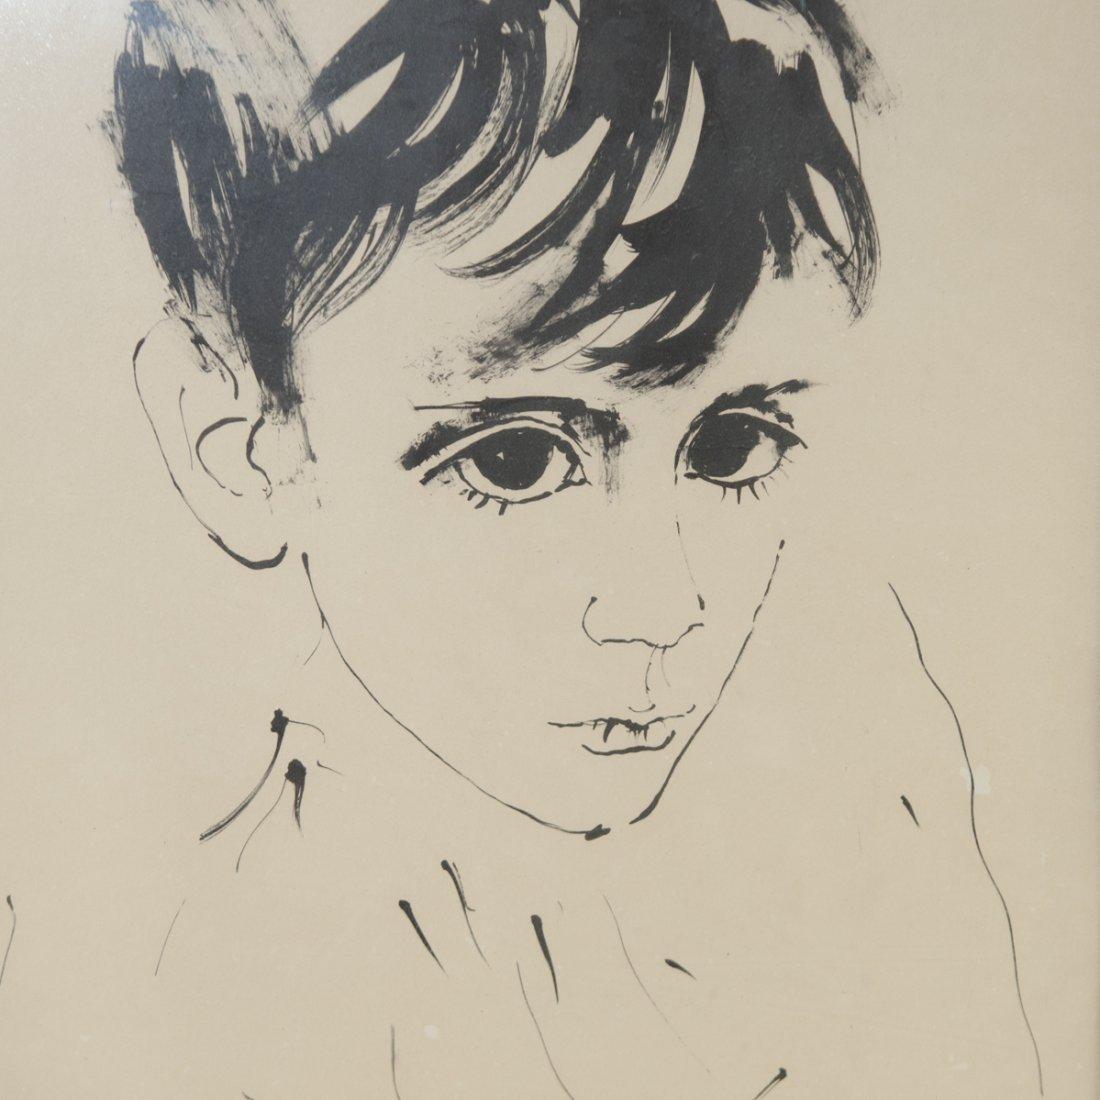 Moshe Gat (Israel b. 1935) Artist Proof - 2